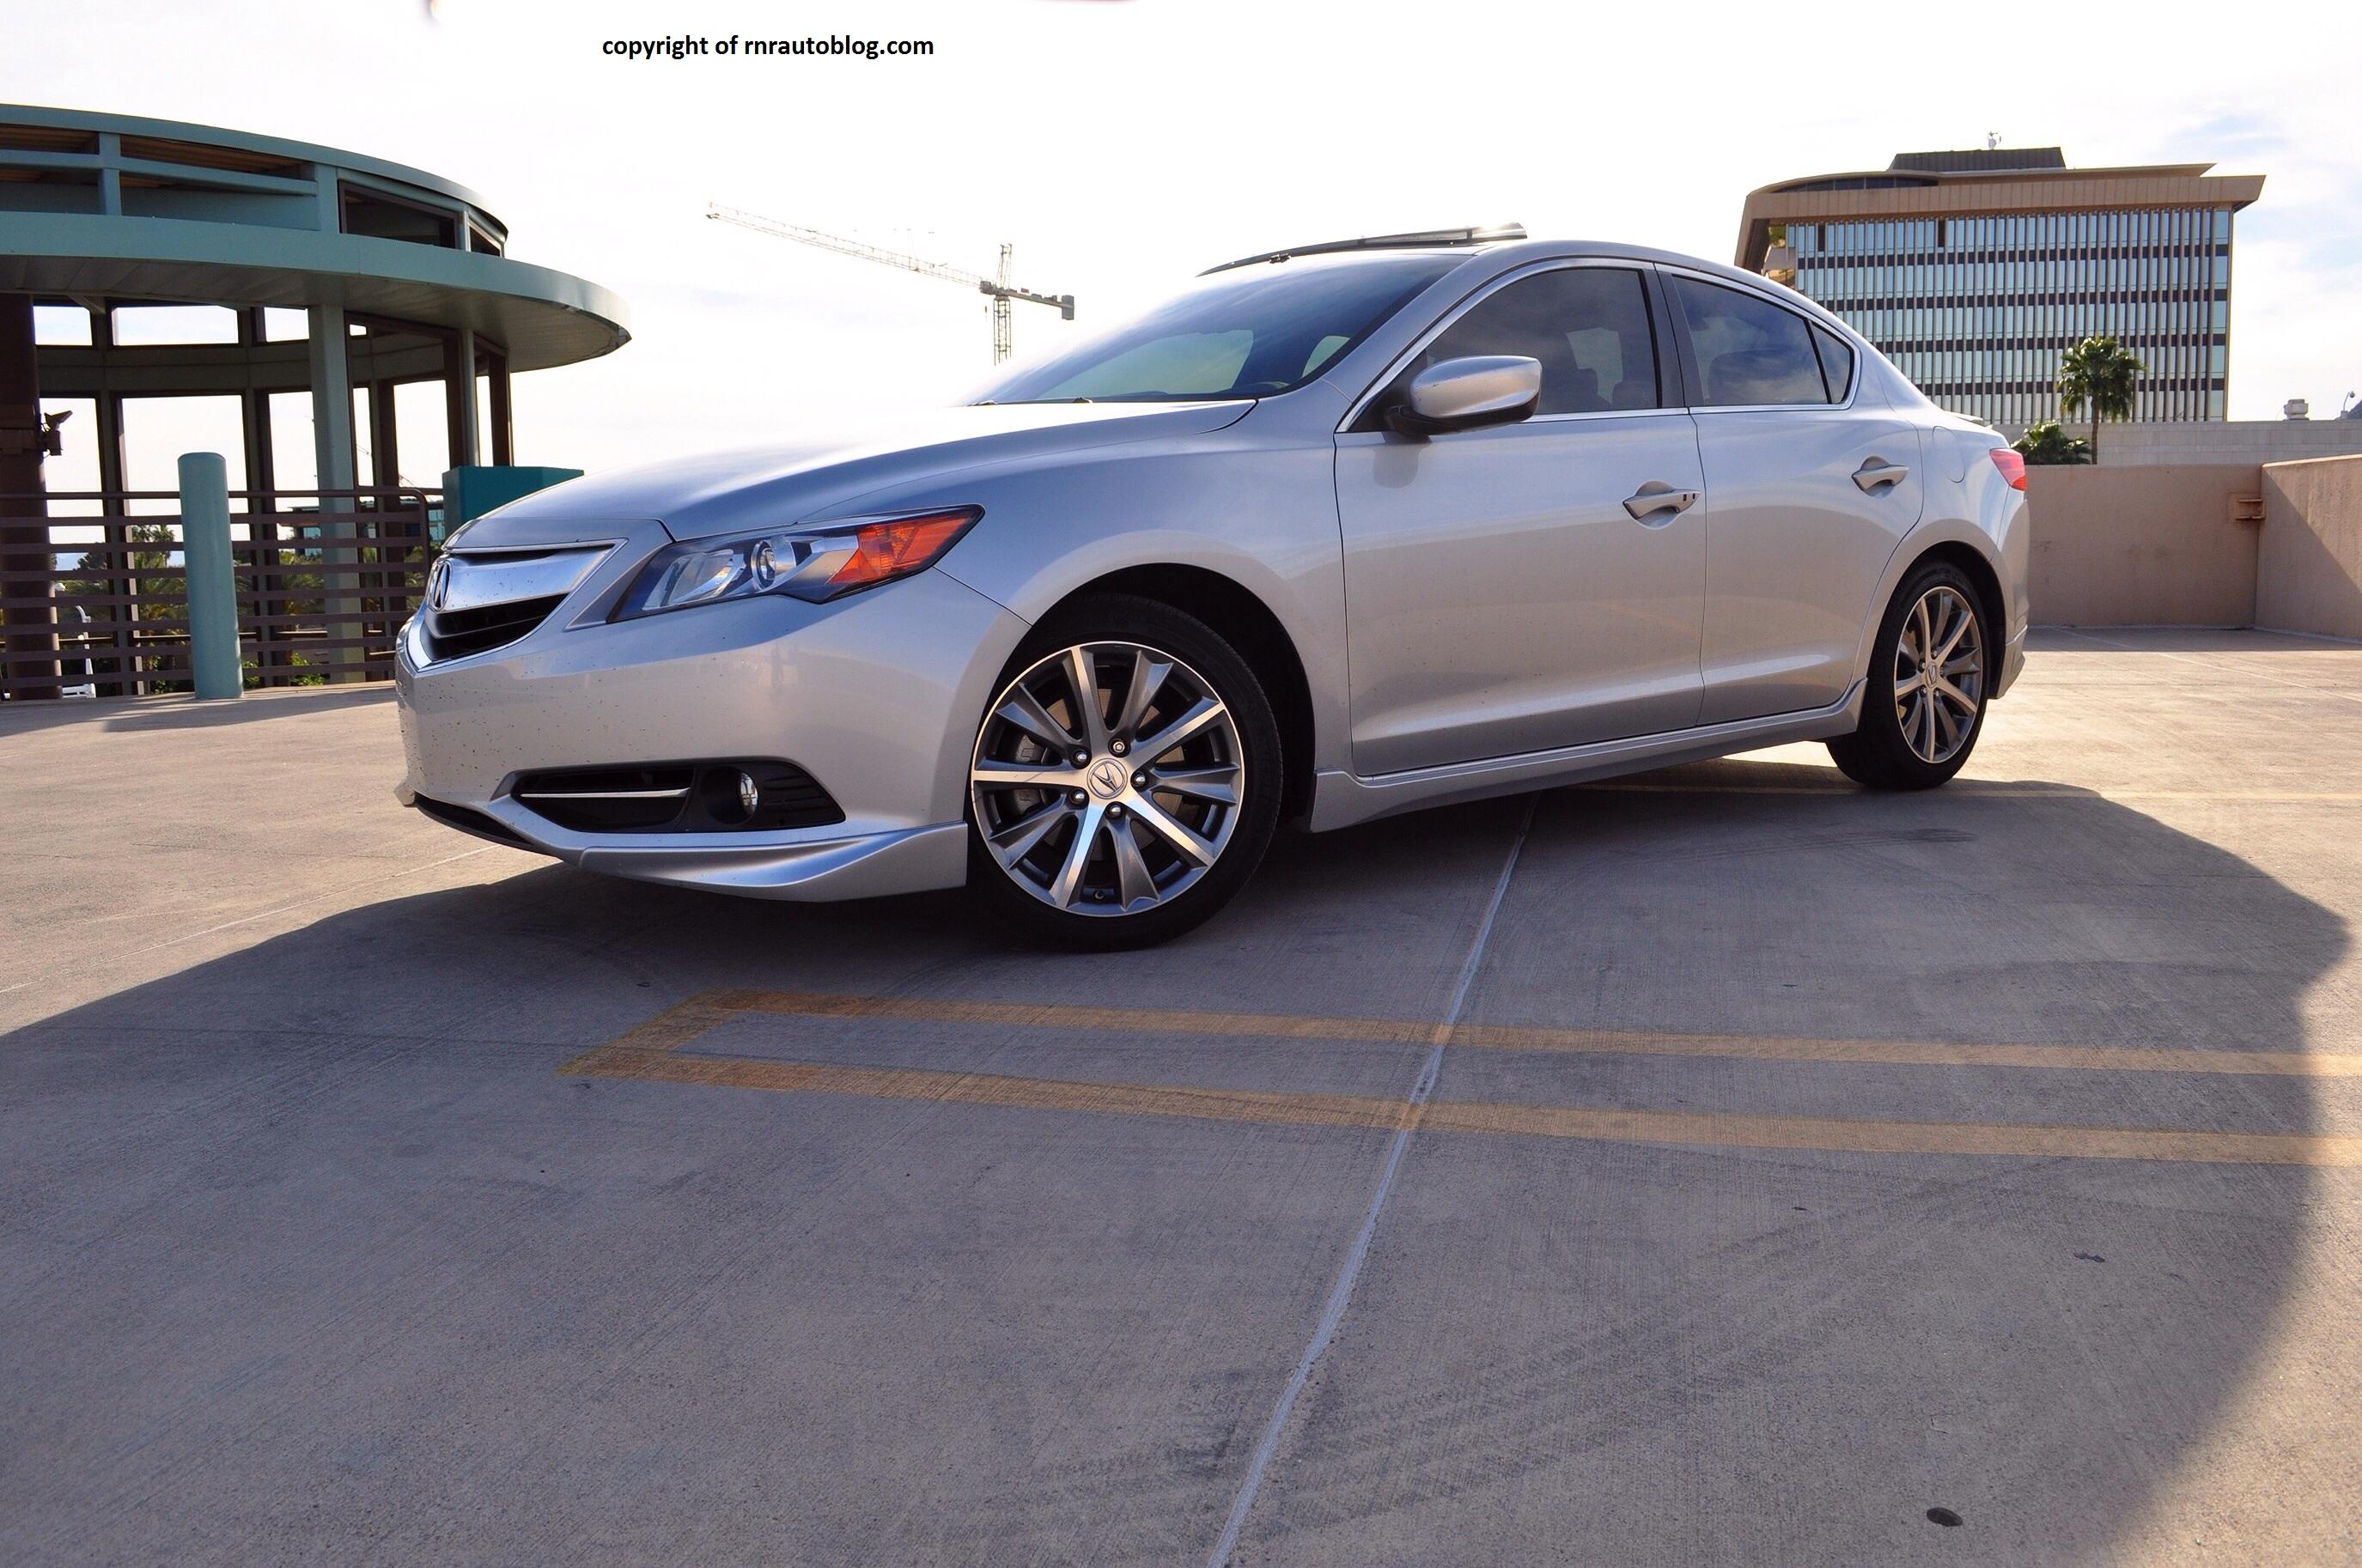 2013 Acura ILX 2.4 Review | RNR Automotive Blog